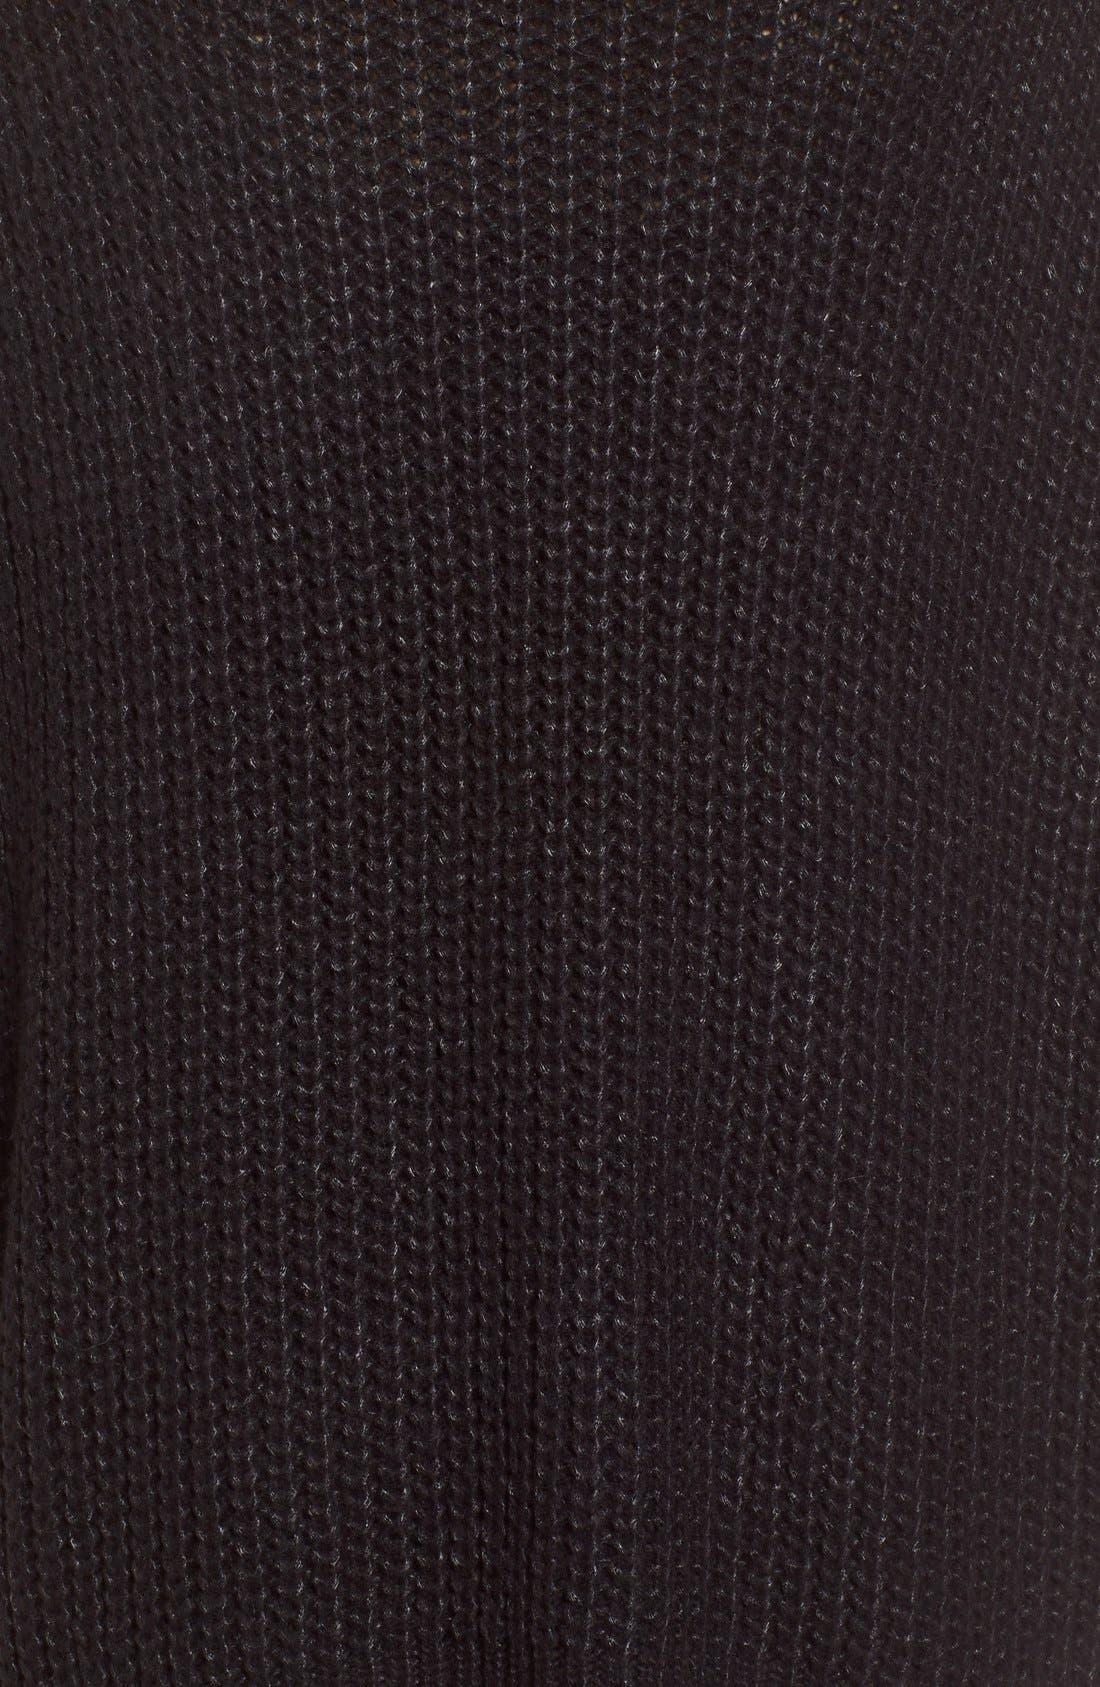 Oversize Turtleneck Sweater,                             Alternate thumbnail 3, color,                             001